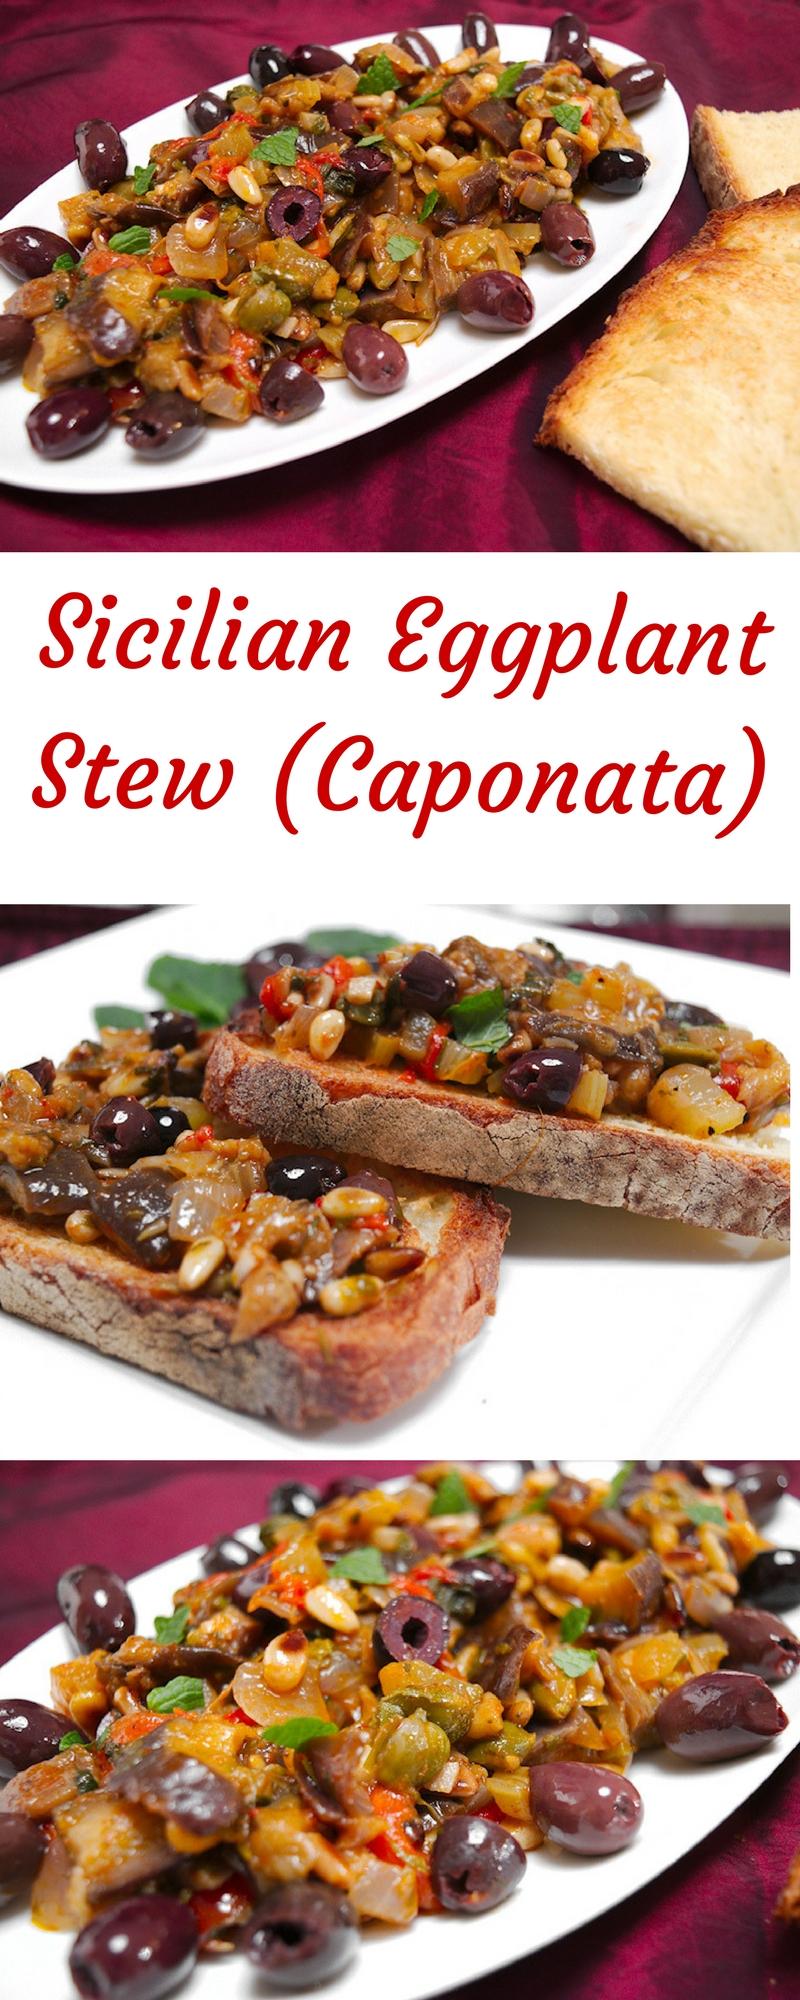 Sicilian Eggplant Stew with Herbs (Caponata)